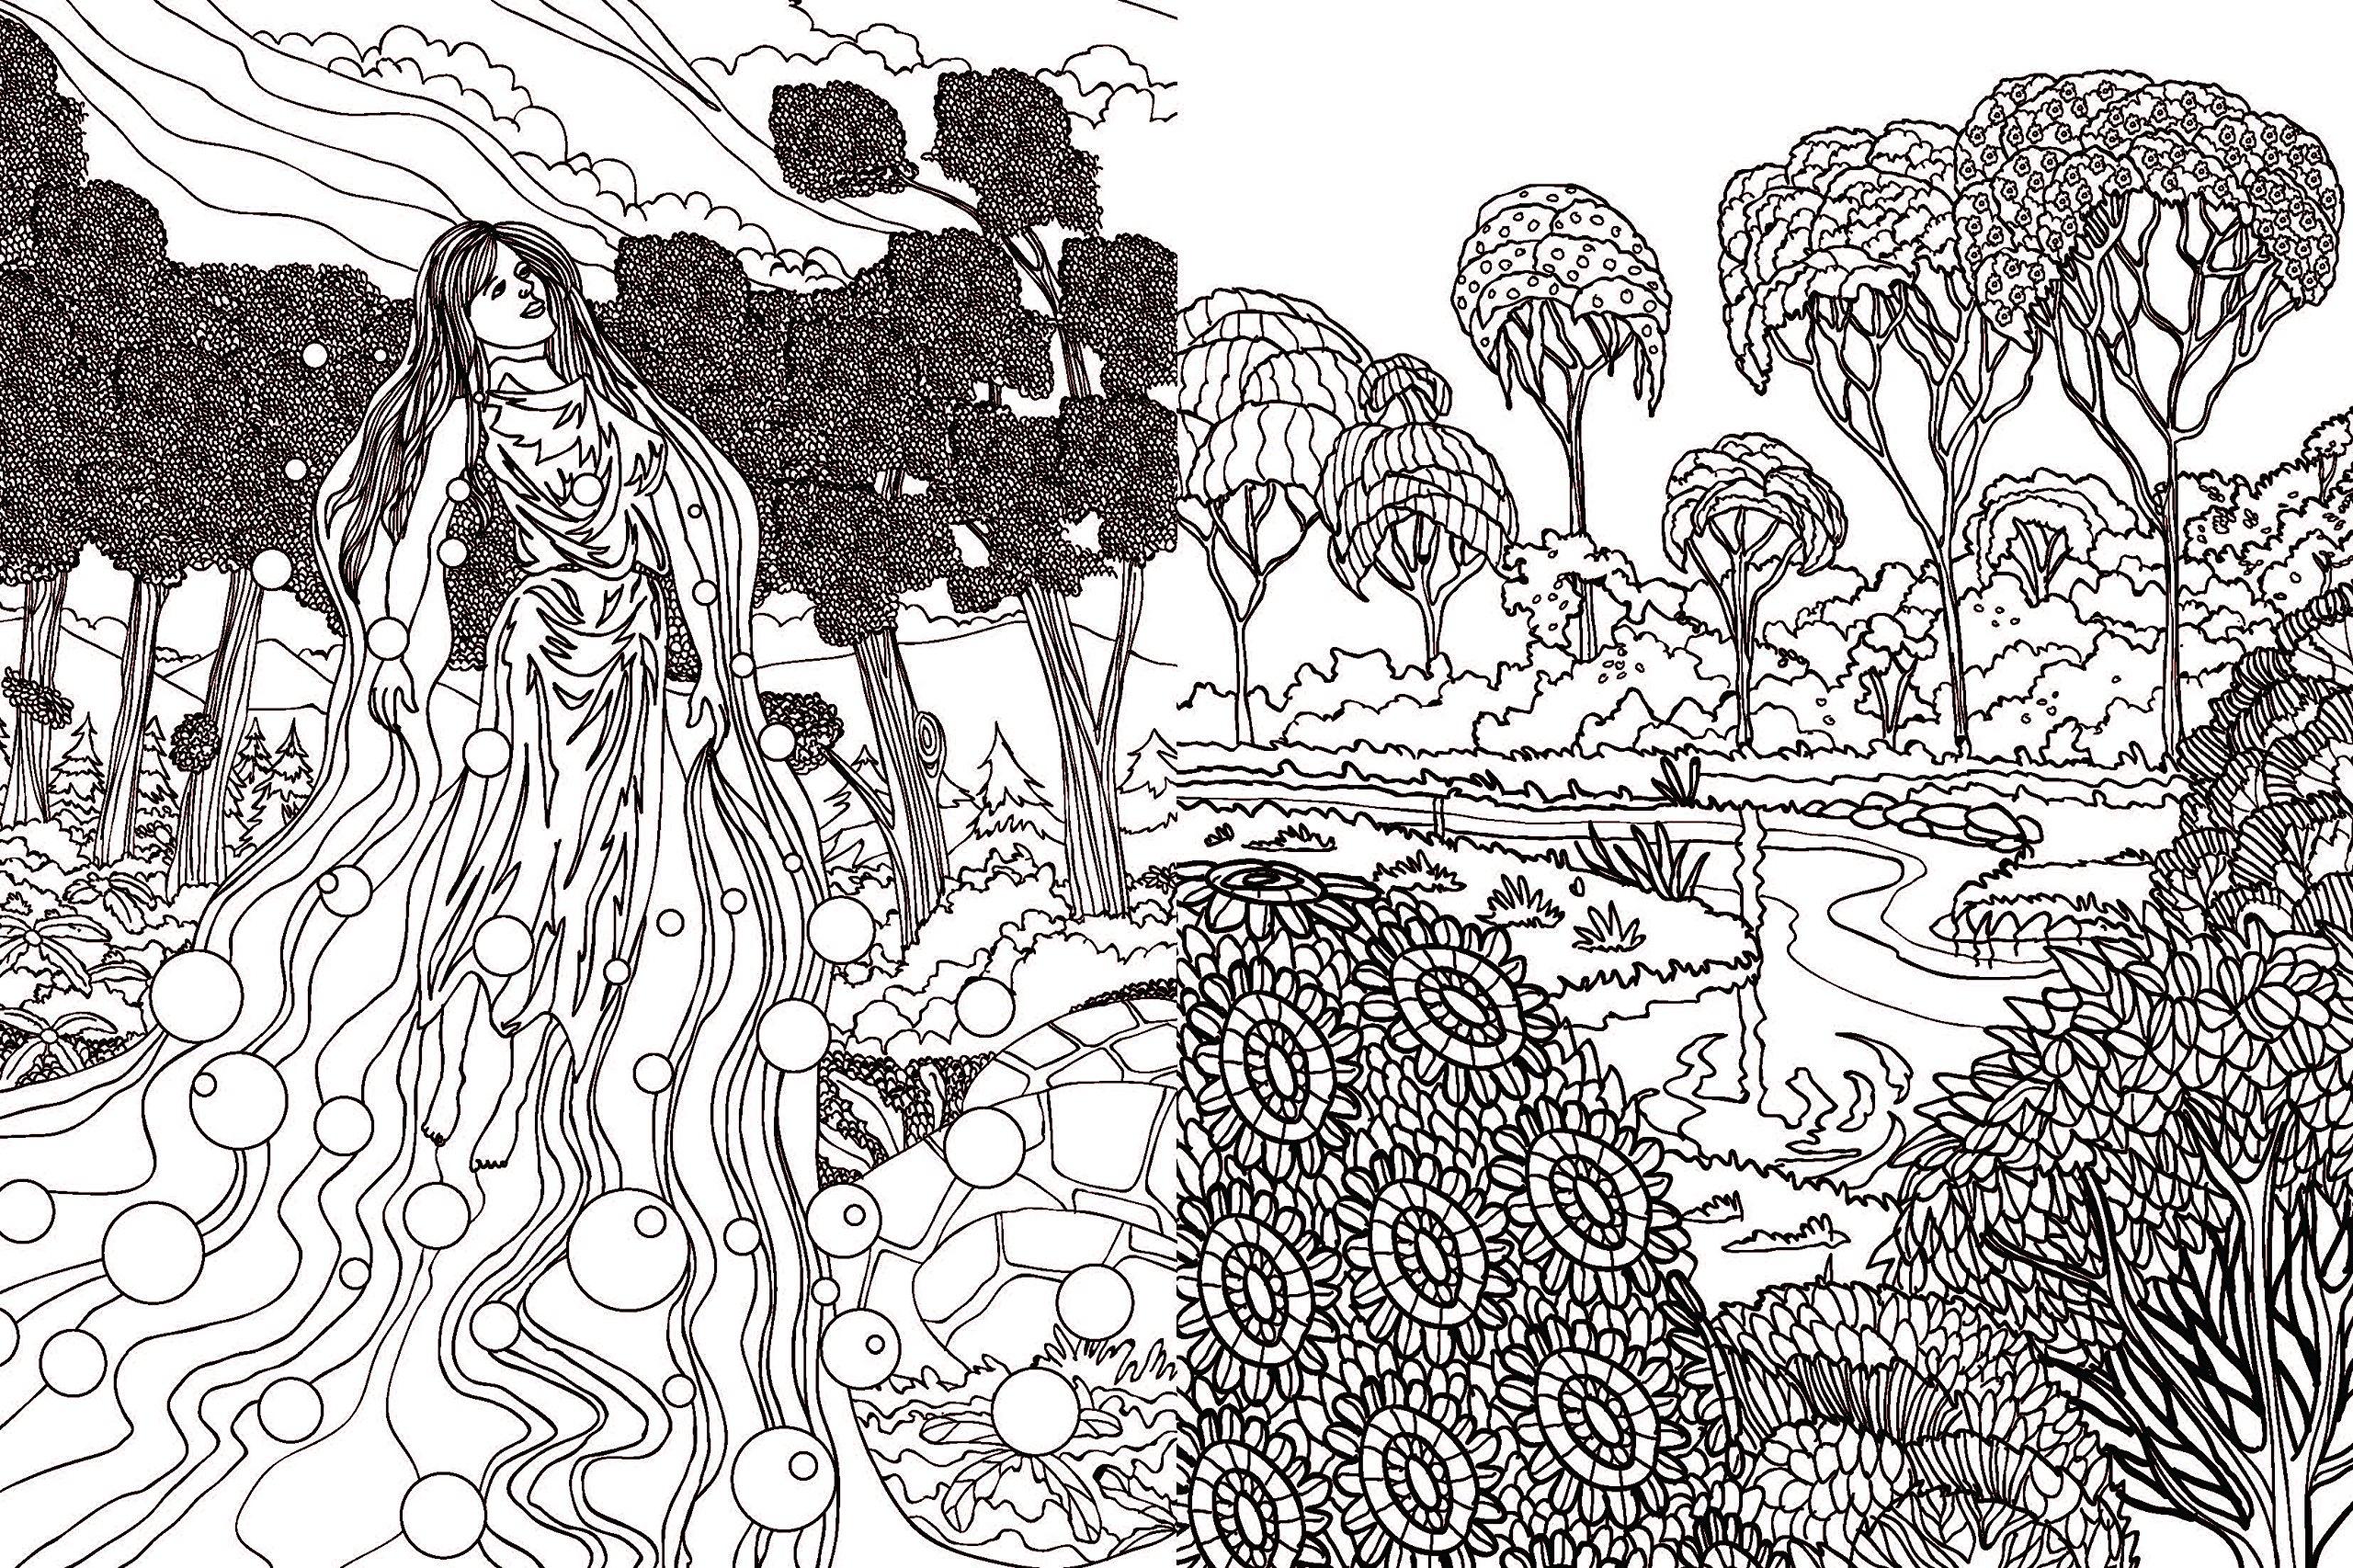 Relax Art: Zauberwald & Fabelwesen: Ausmalen & entspannen: Amazon